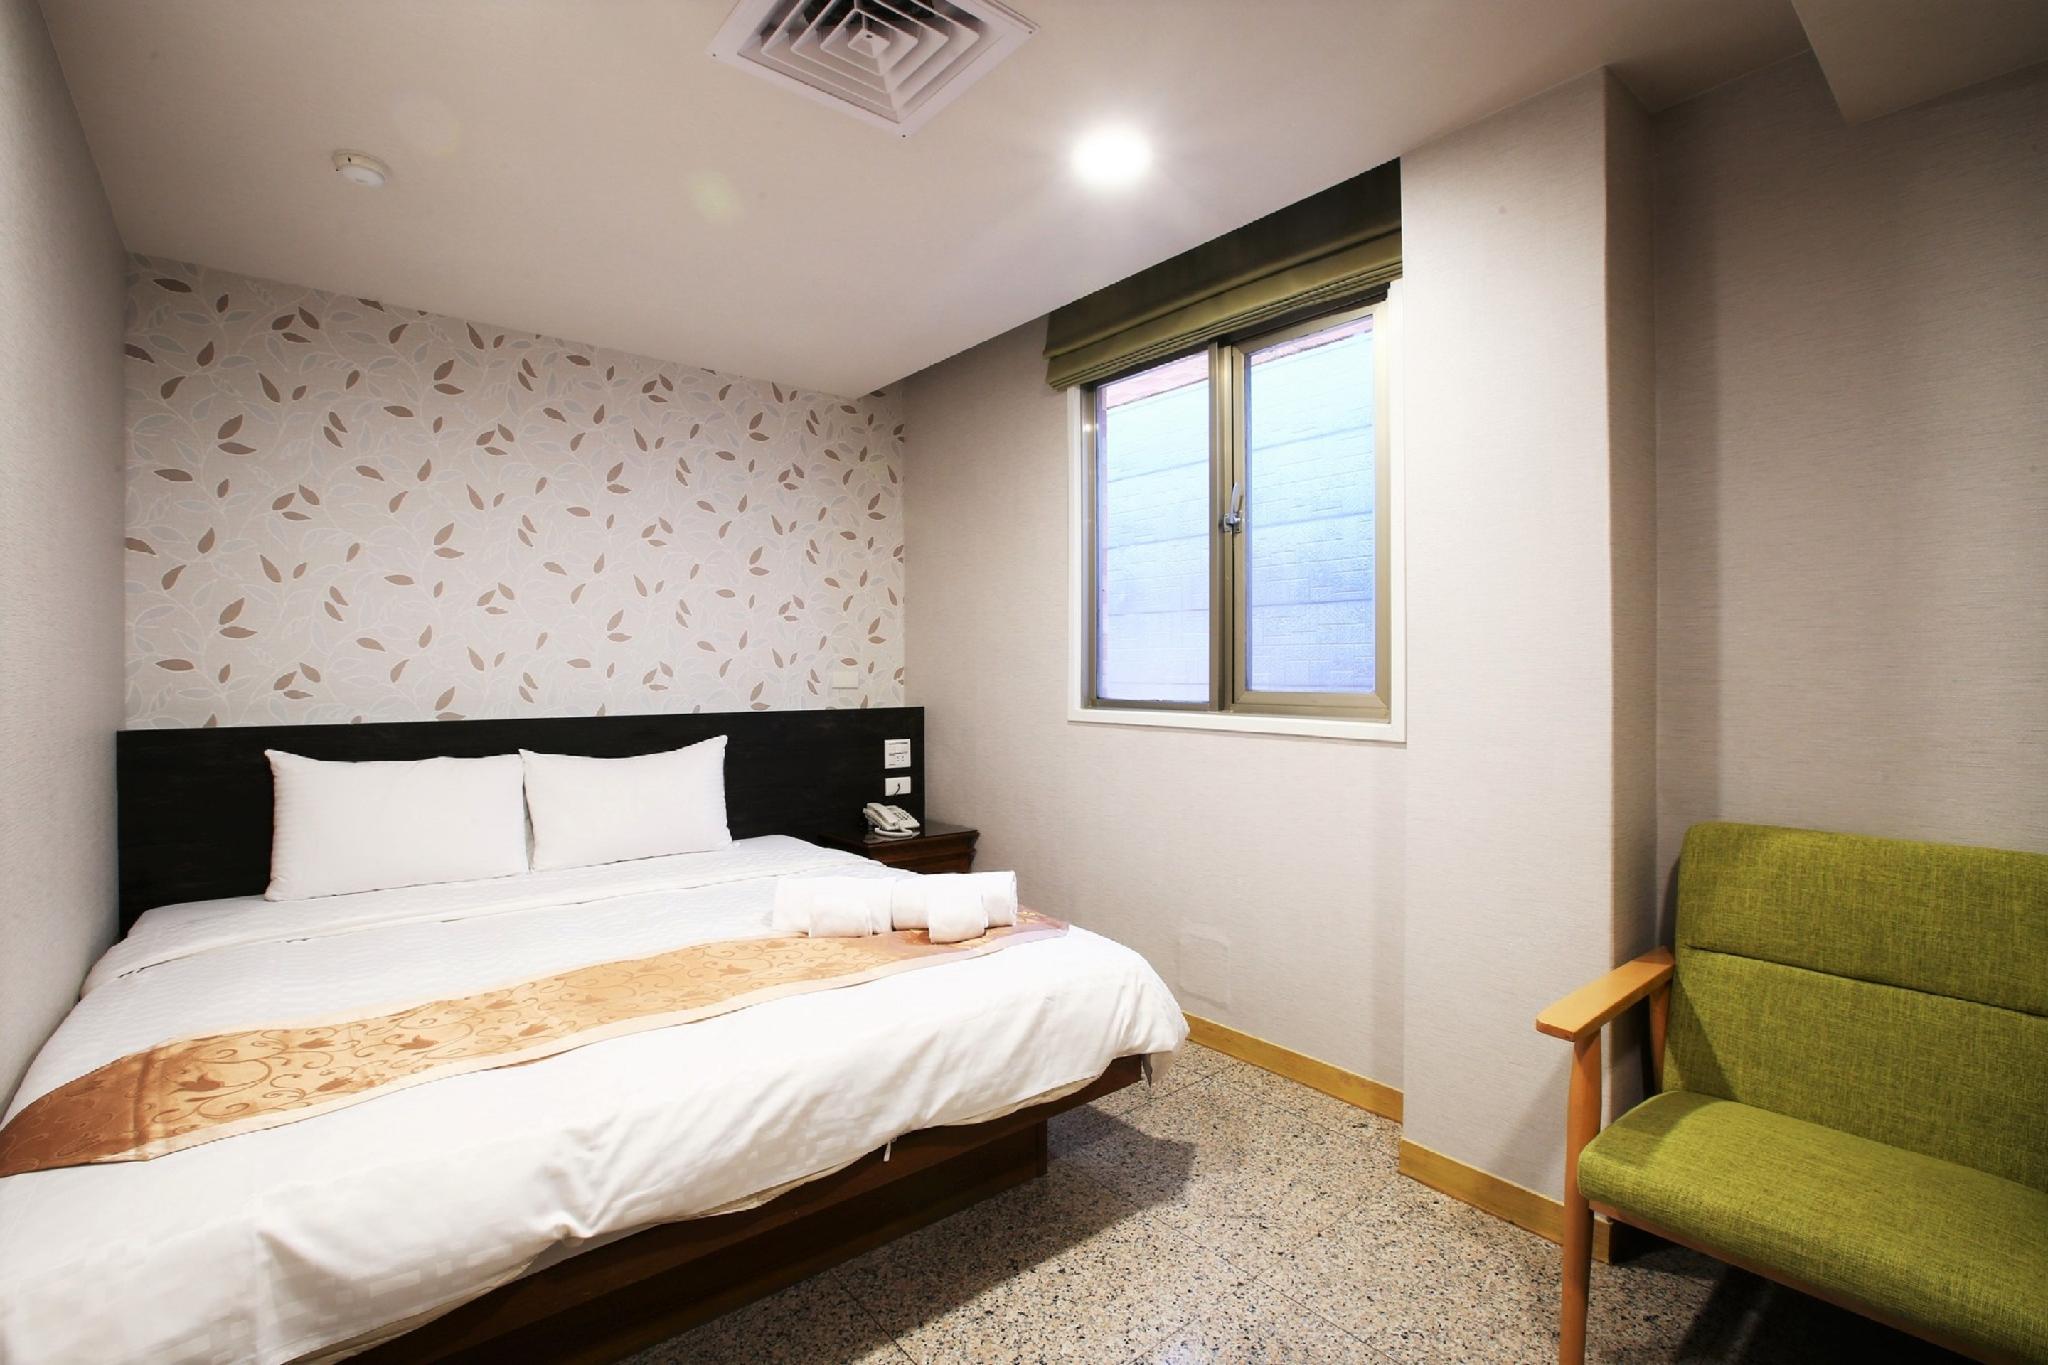 Huhome PVC Wall Stickers Wallpaper Dallas Stars star bed bedroom children/'s room